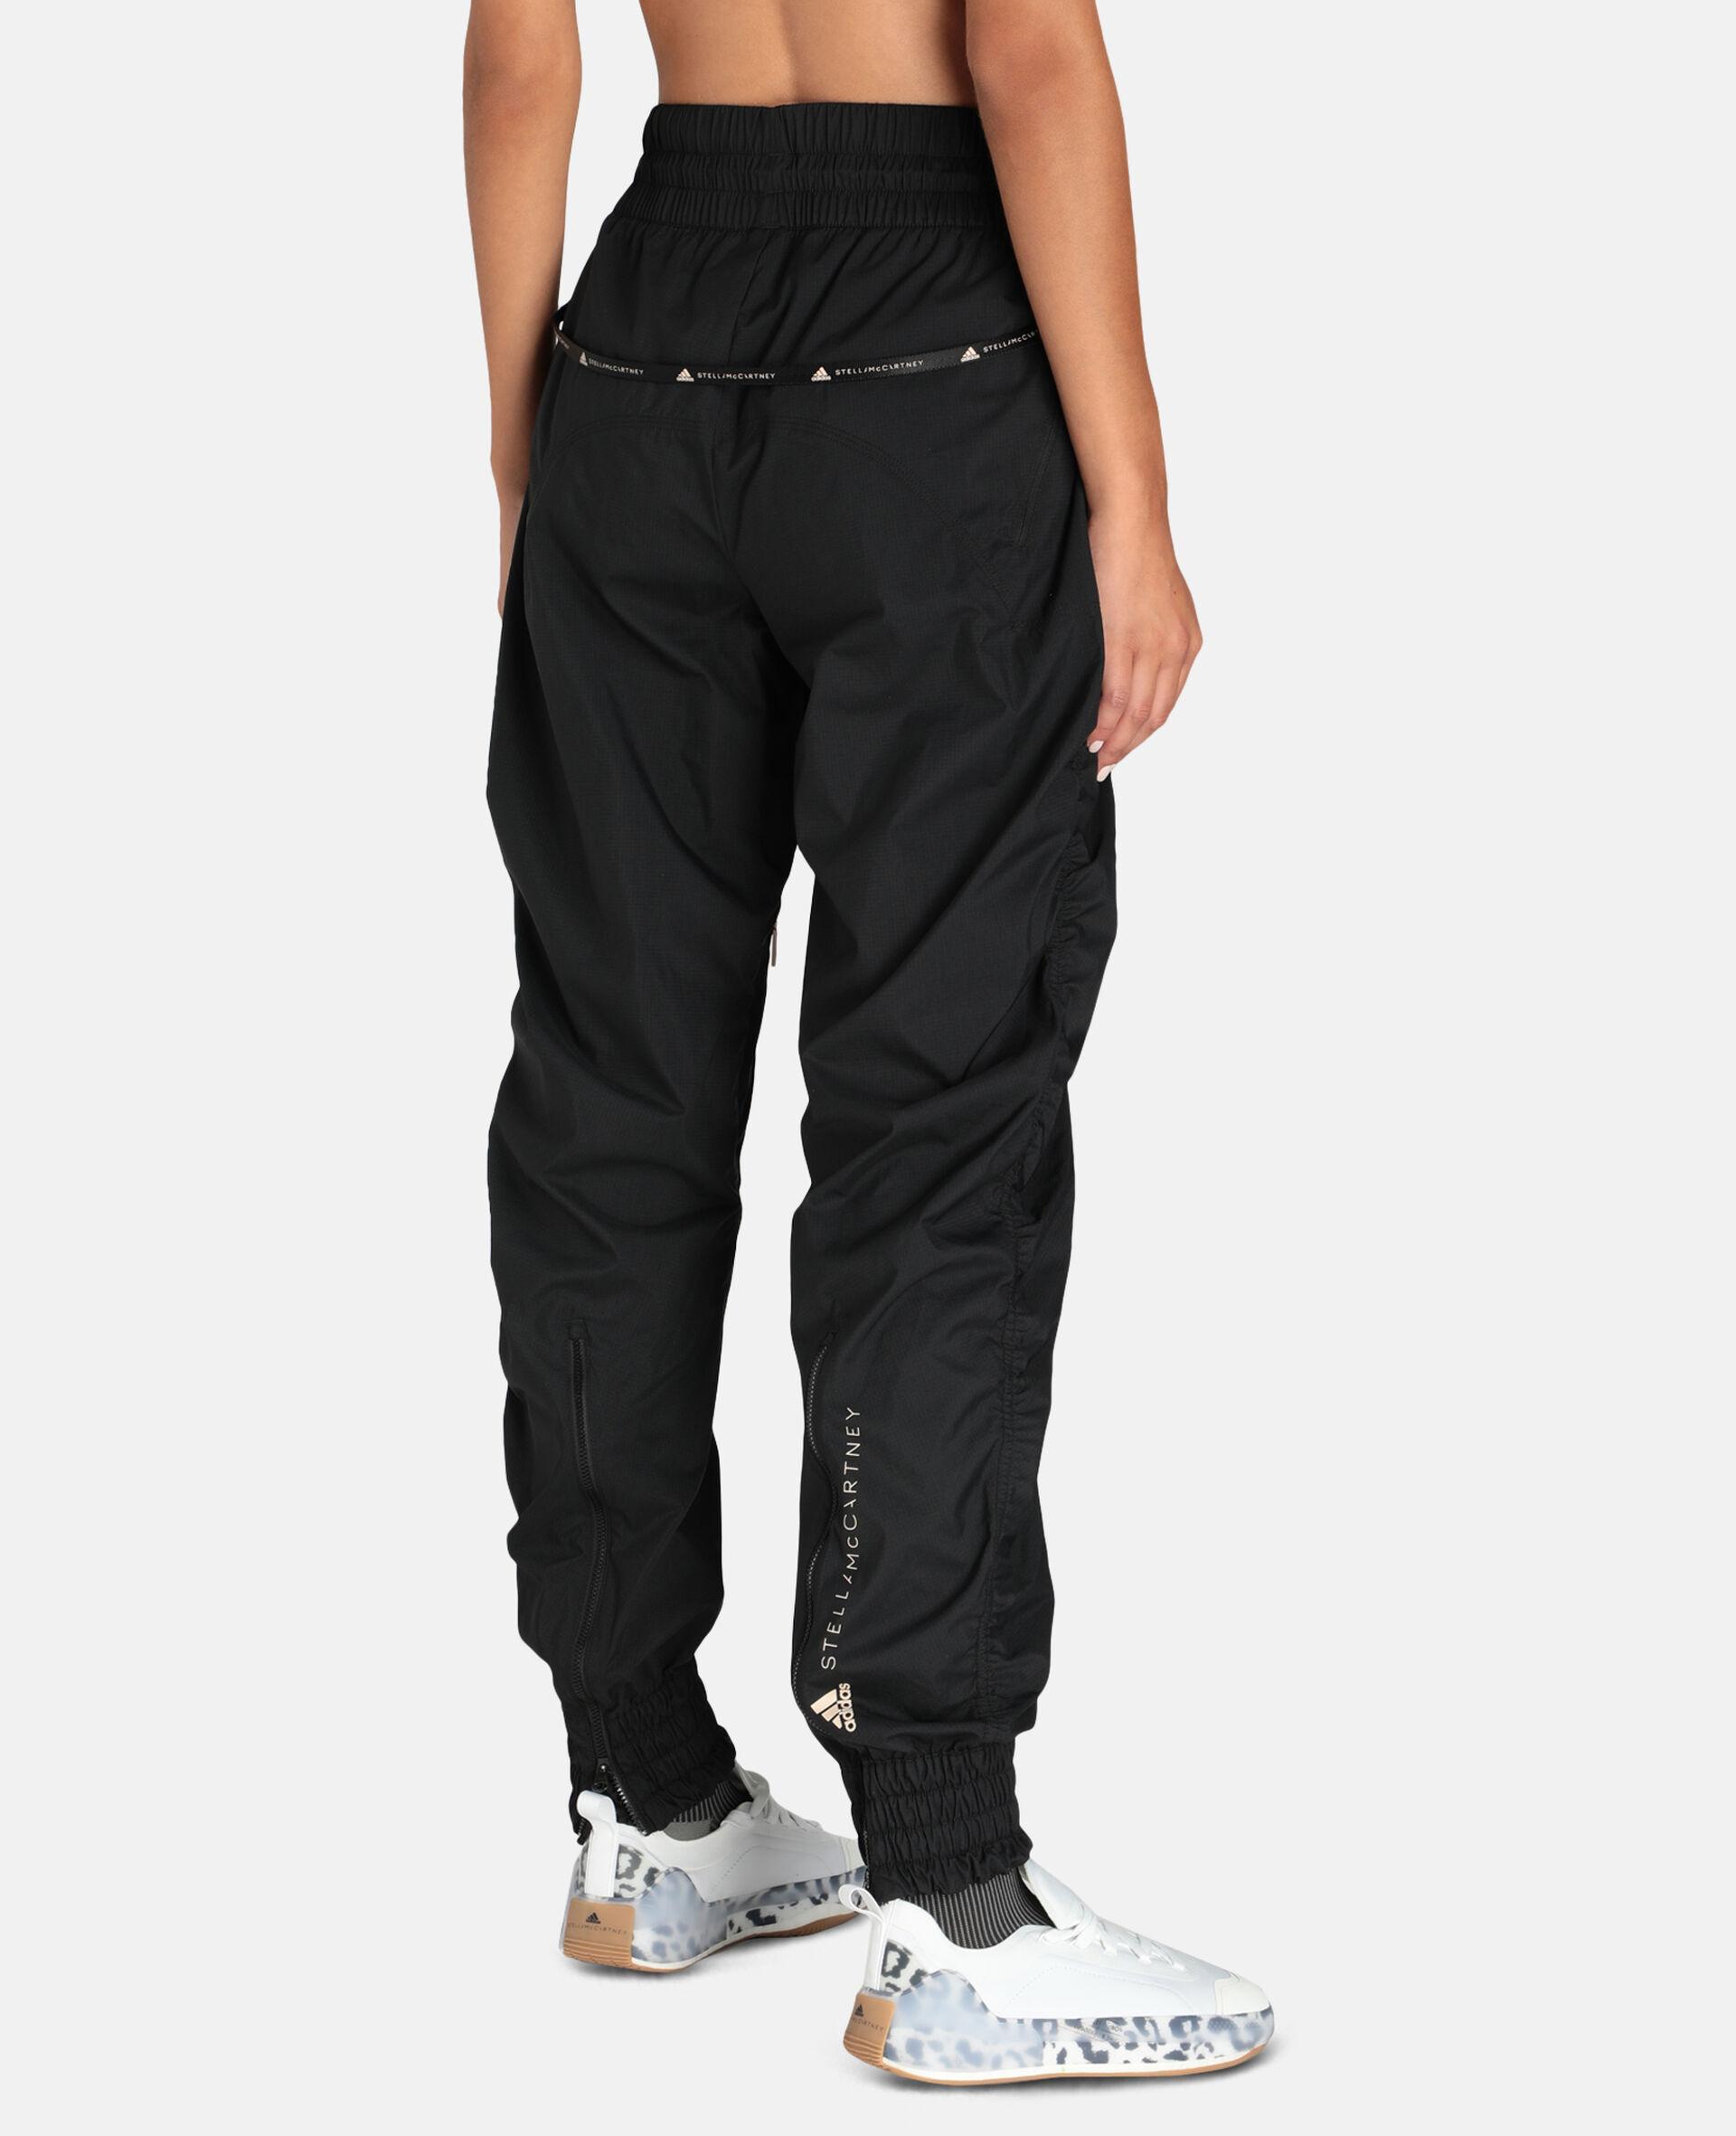 Black Woven Training Pants-Black-large image number 2